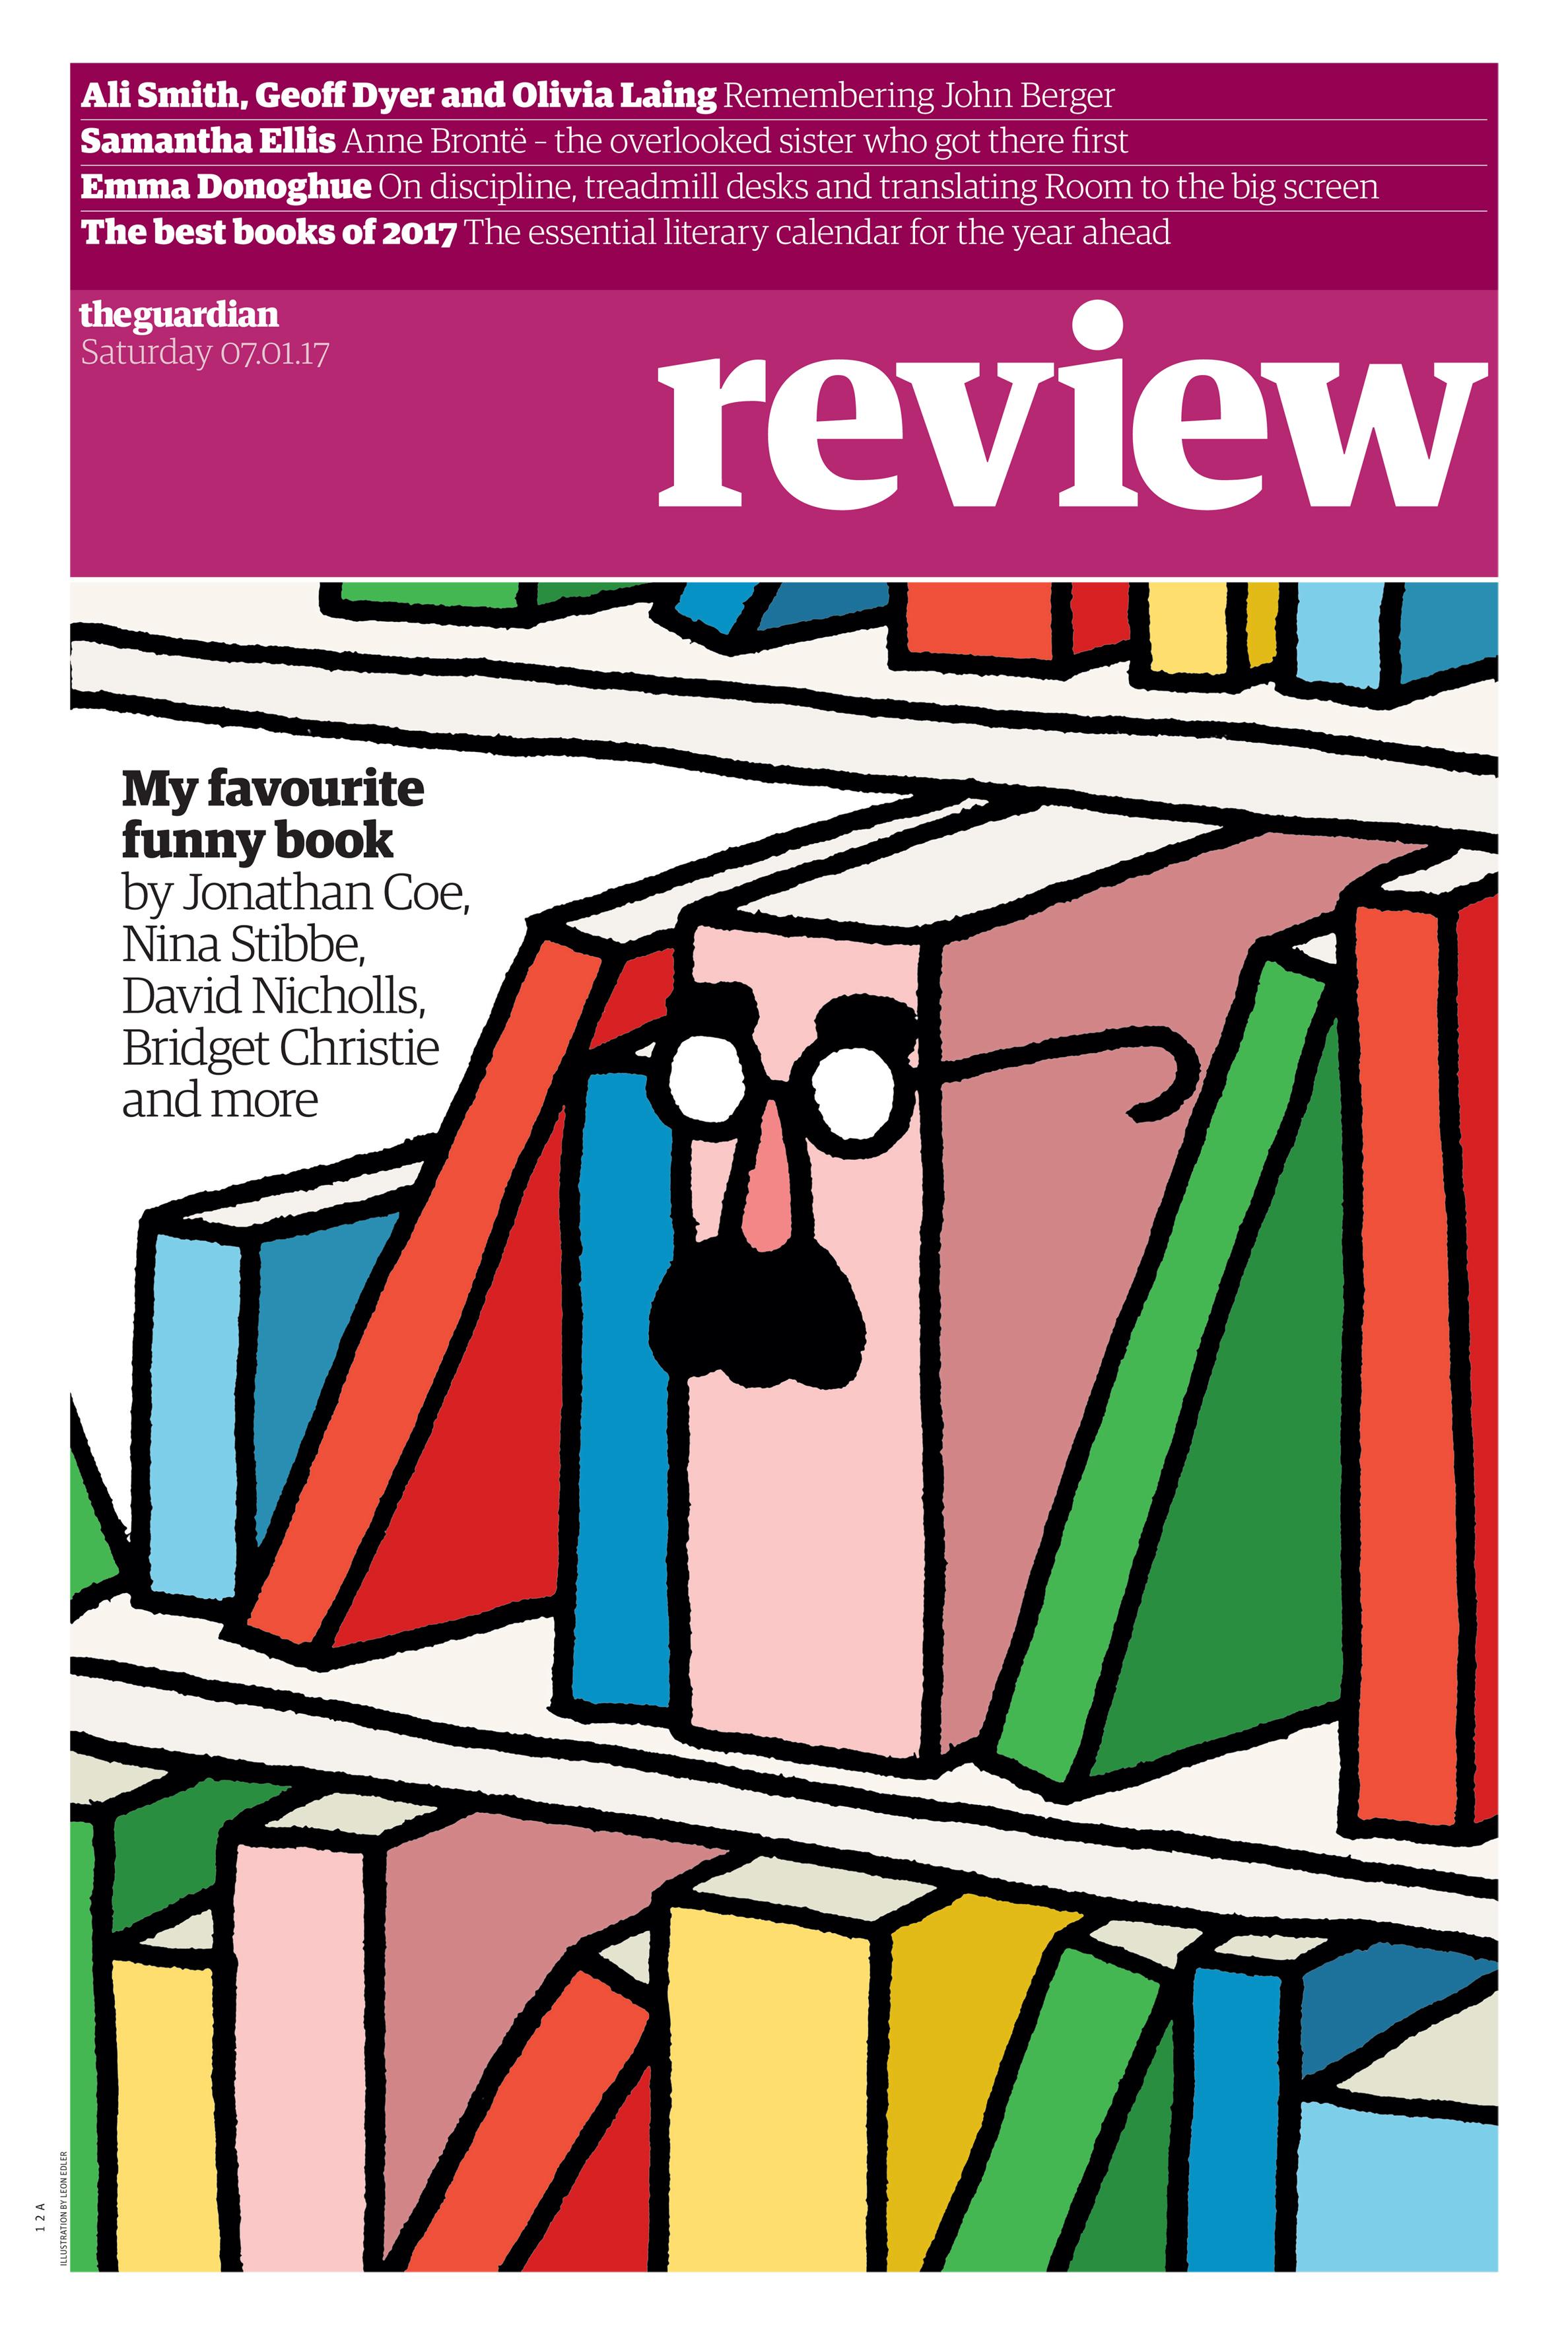 Guardian Review Cover print.jpg